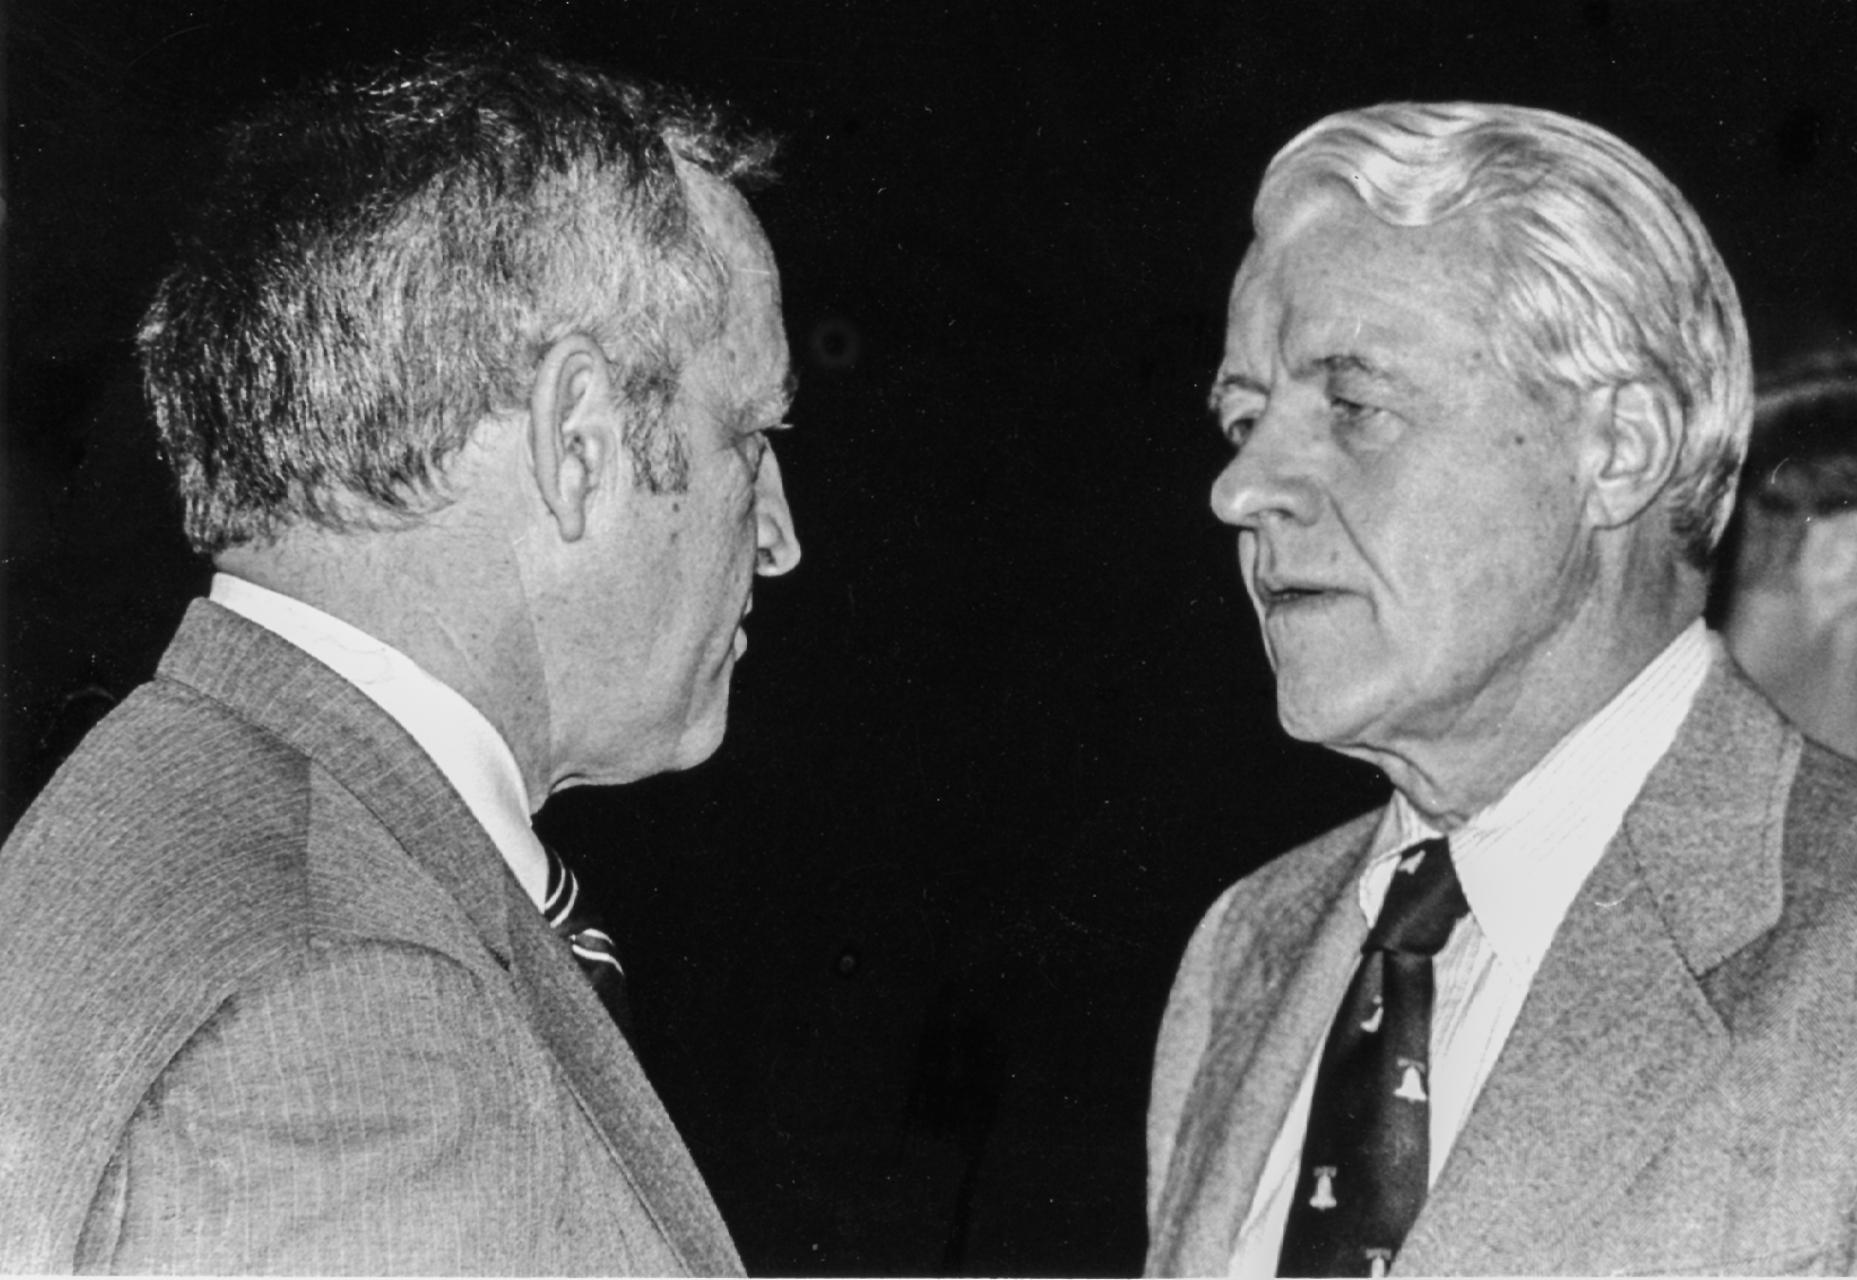 Barnhart and Orr